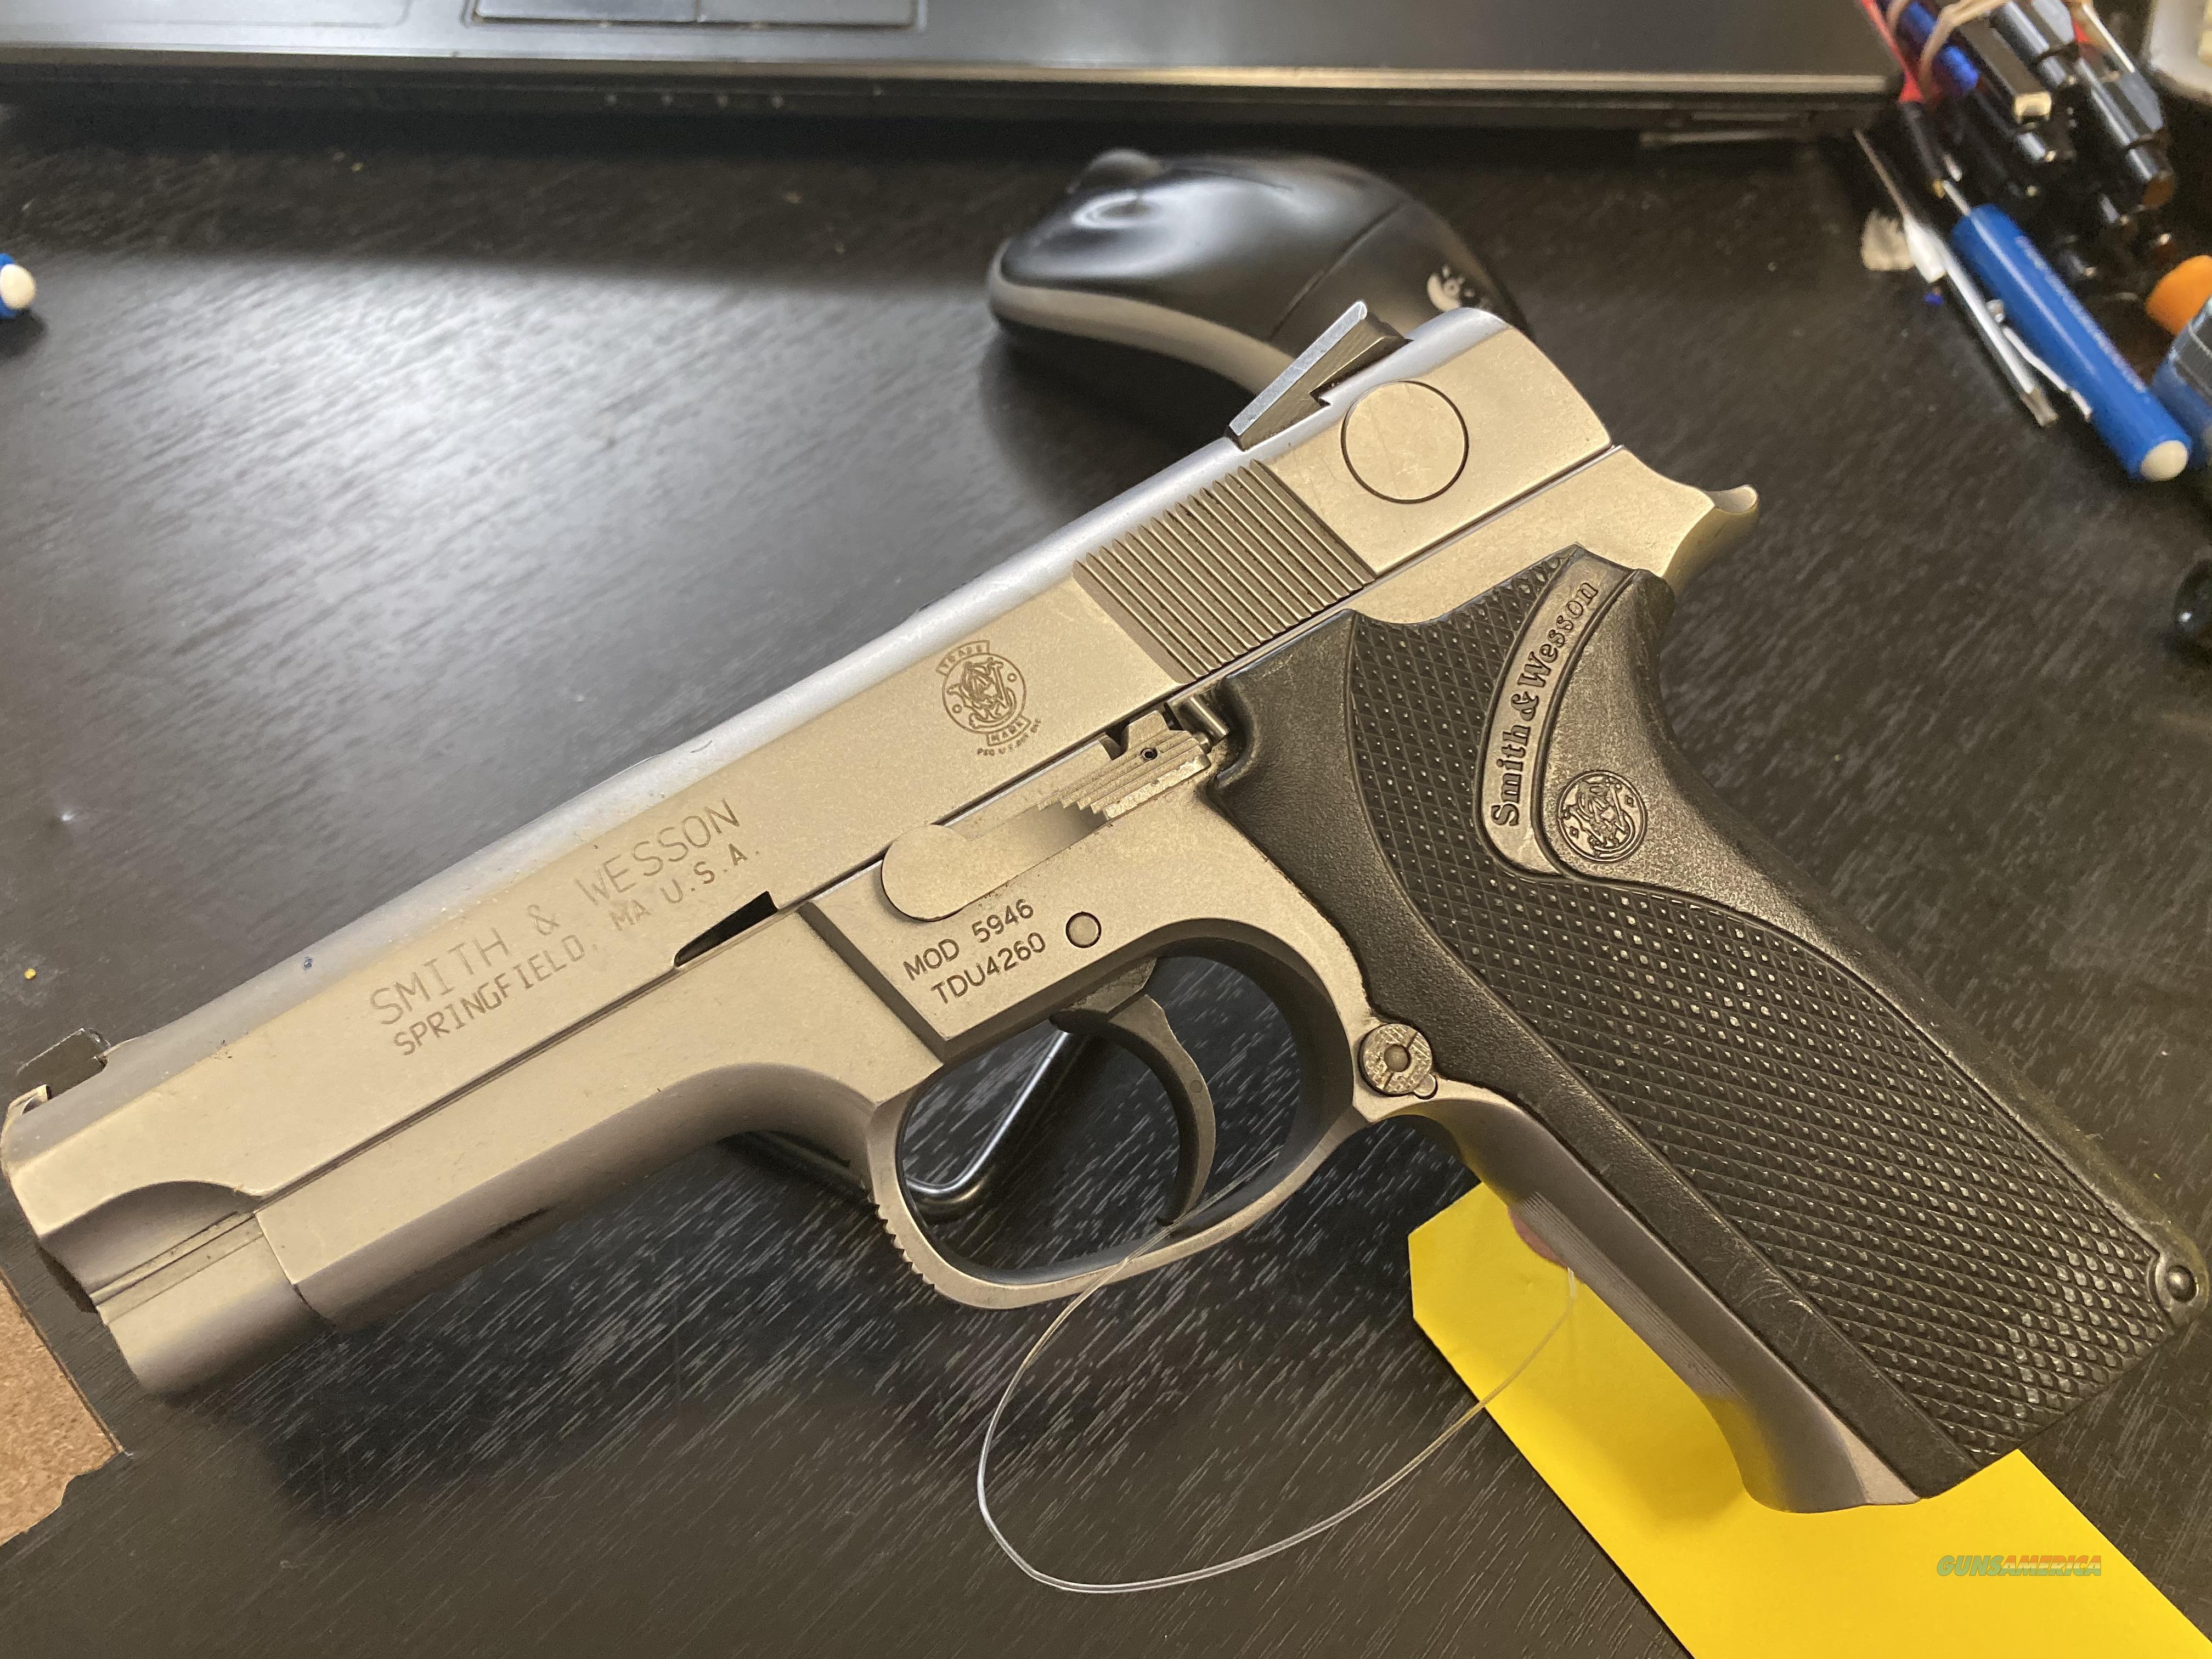 Smith & Wesson 5946  Guns > Pistols > Smith & Wesson Pistols - Autos > Alloy Frame